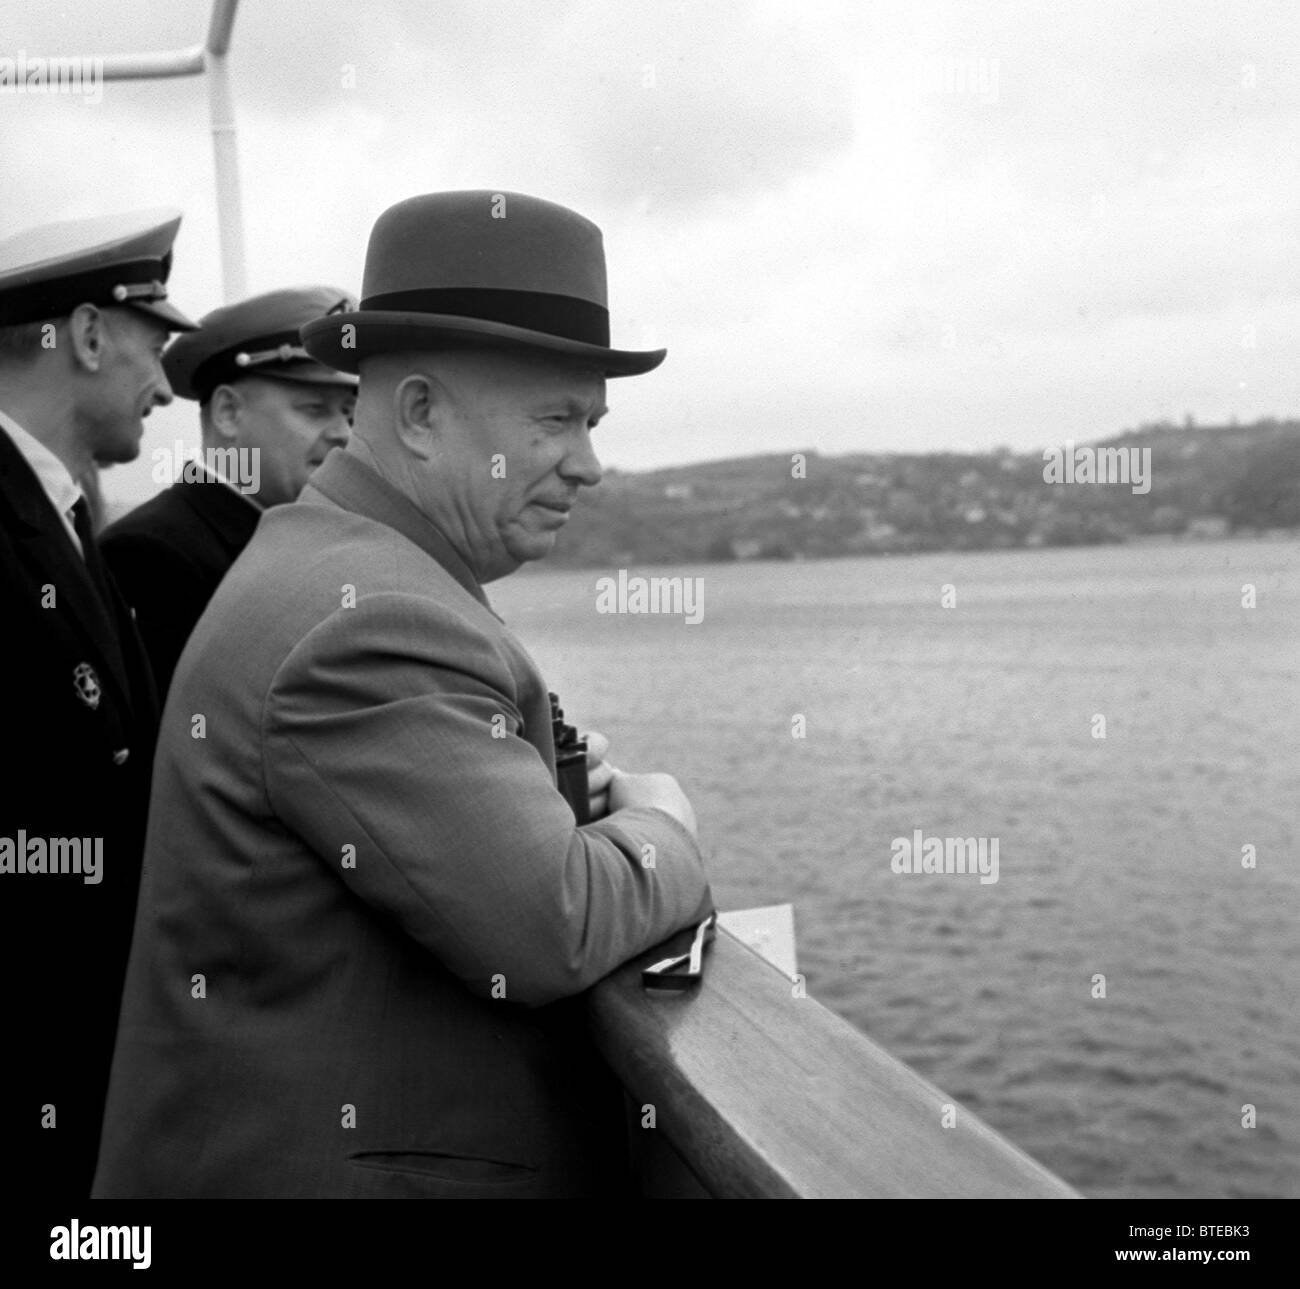 Nikita Khrushchev on board of Armenia motor ship, 1964 - Stock Image